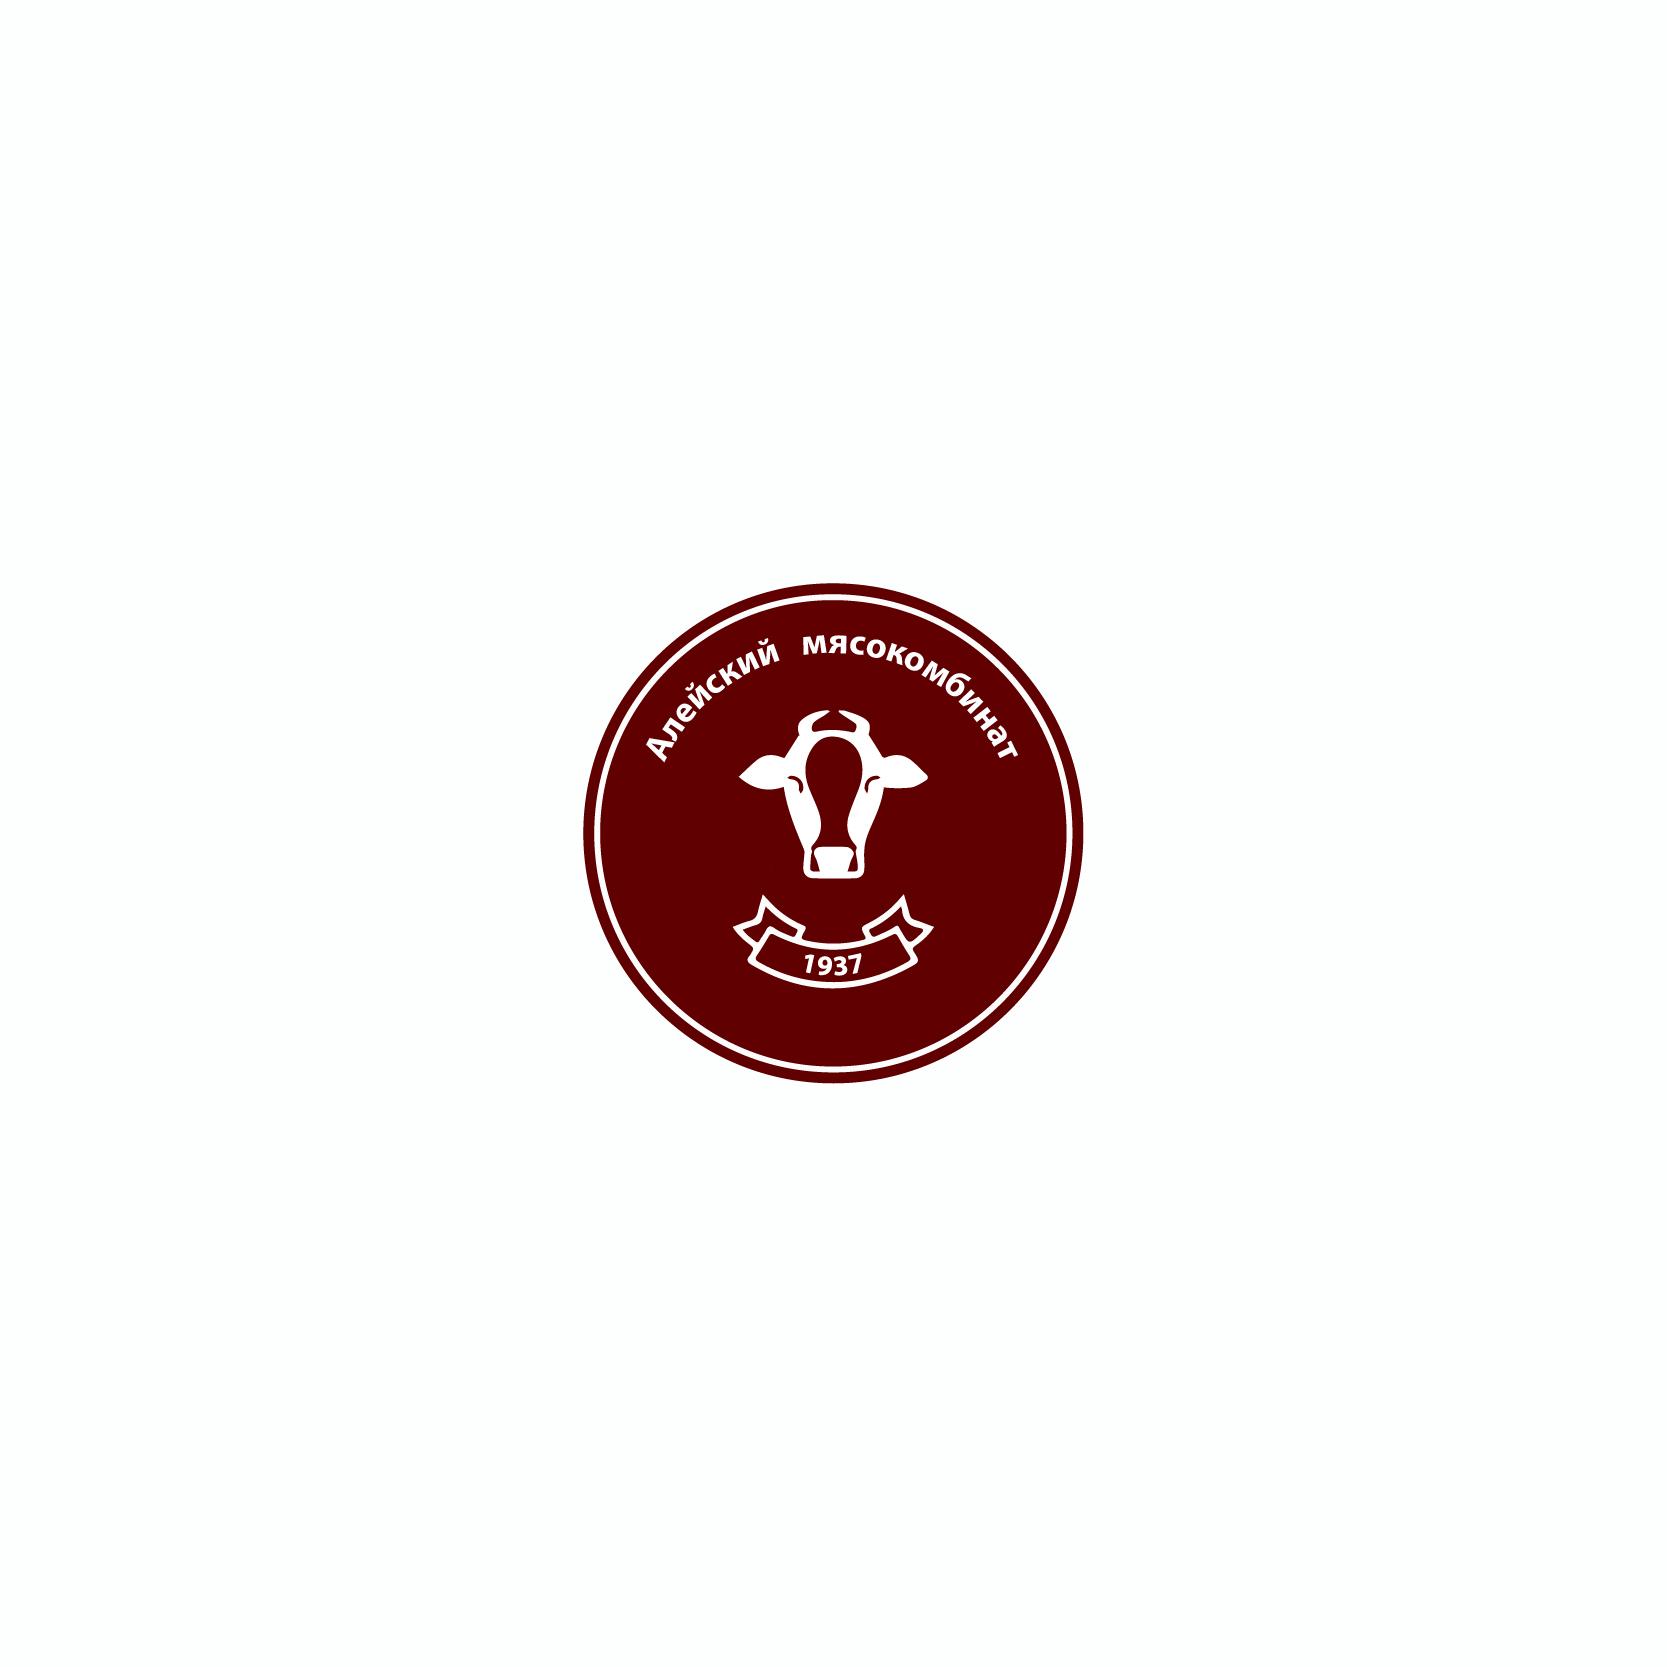 "Разработака логотипа для ООО ""Алейский мясокомбинат"" фото f_1245b1ba198623ea.jpg"